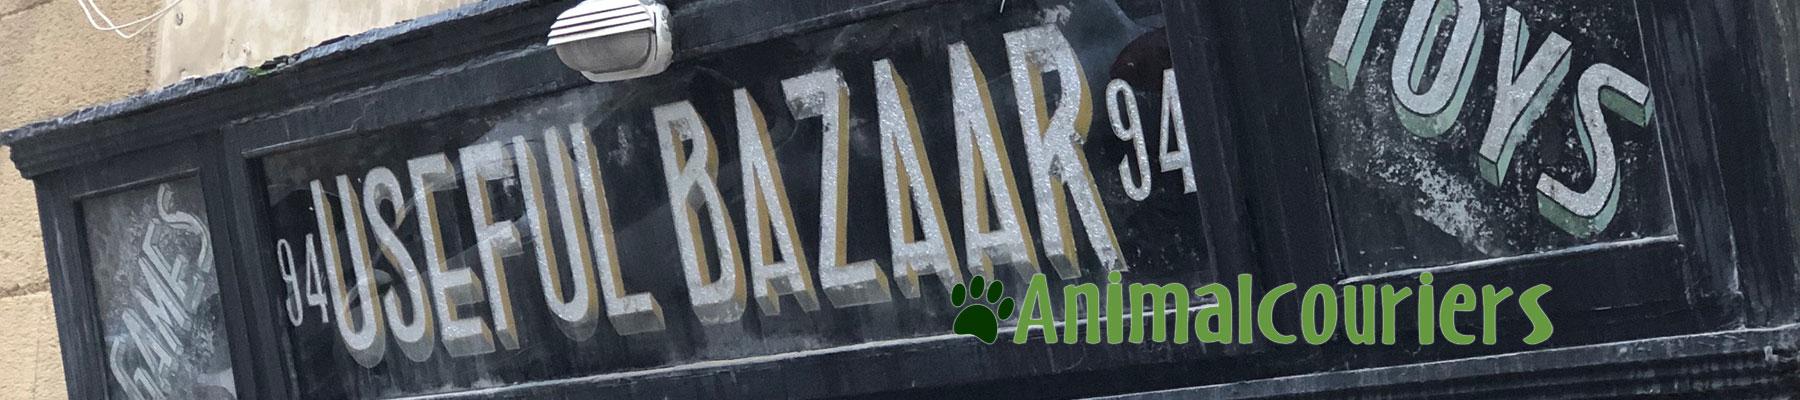 Malta bazaar